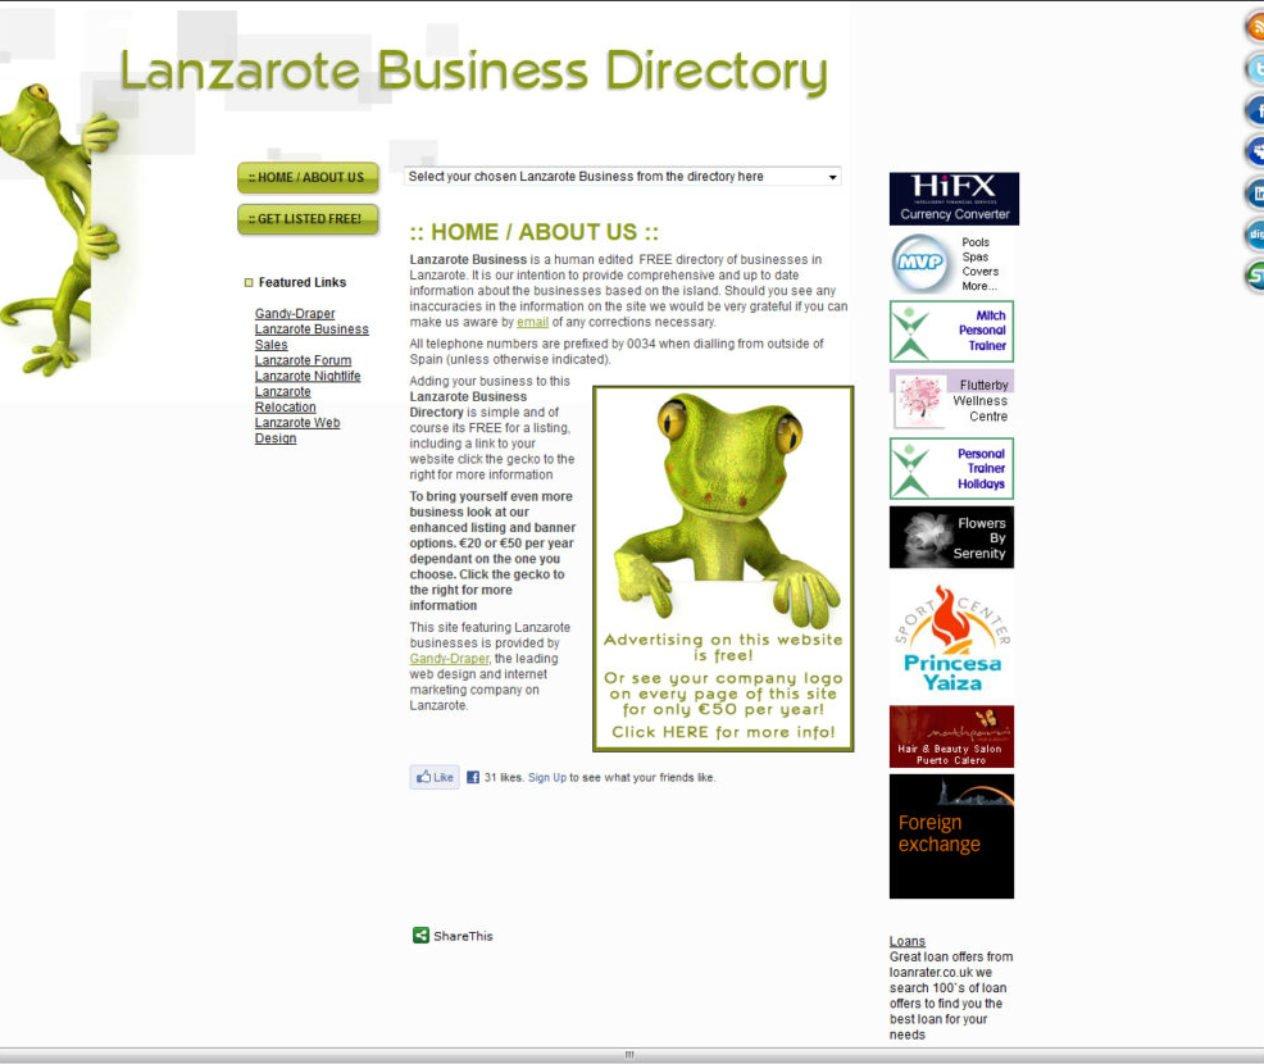 Lanzarote Business